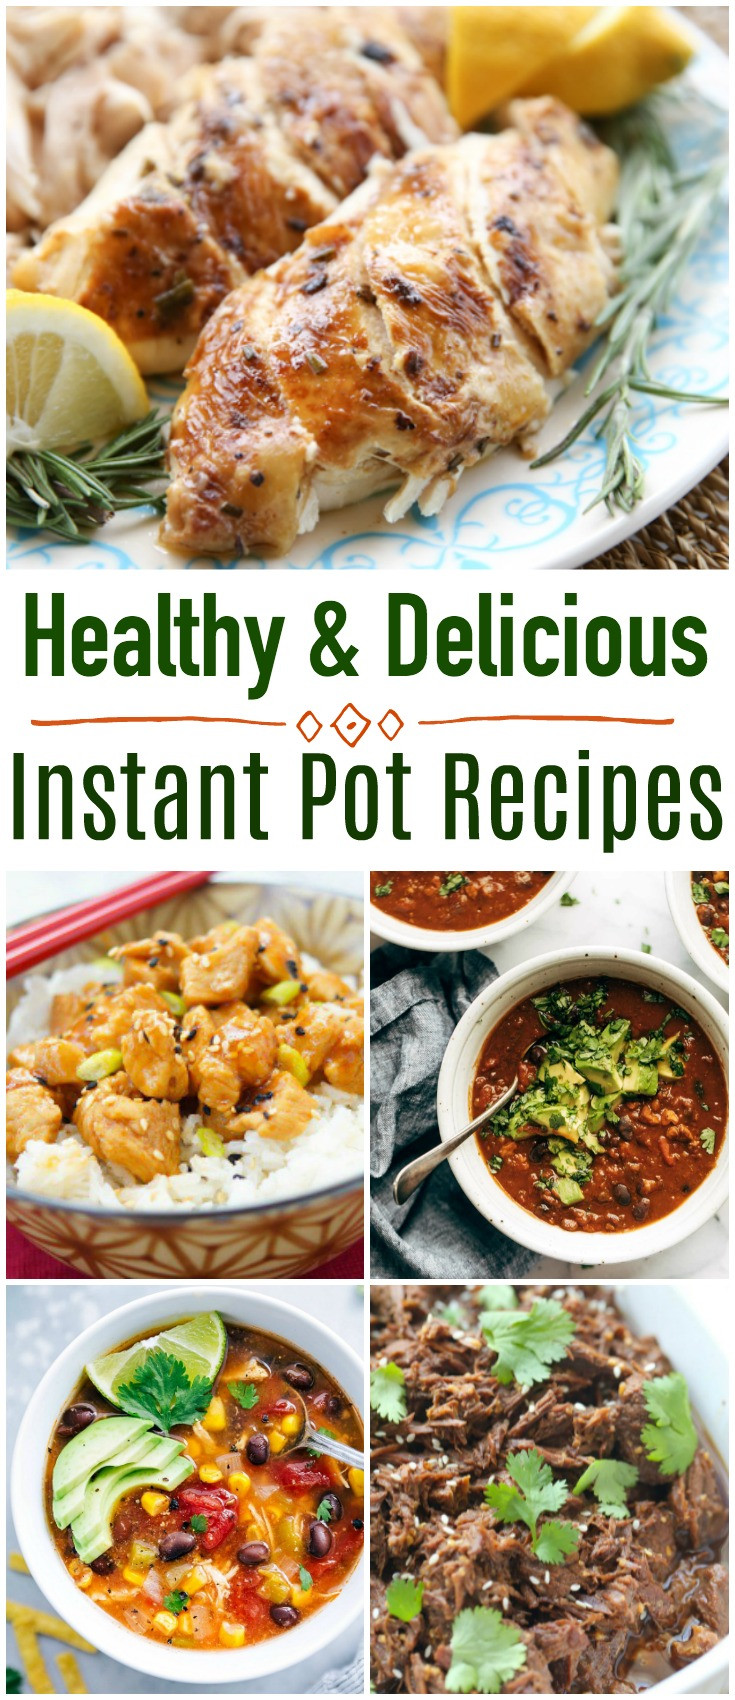 Best Instant Pot Recipes Healthy  Healthy and Delicious Instant Pot Recipes